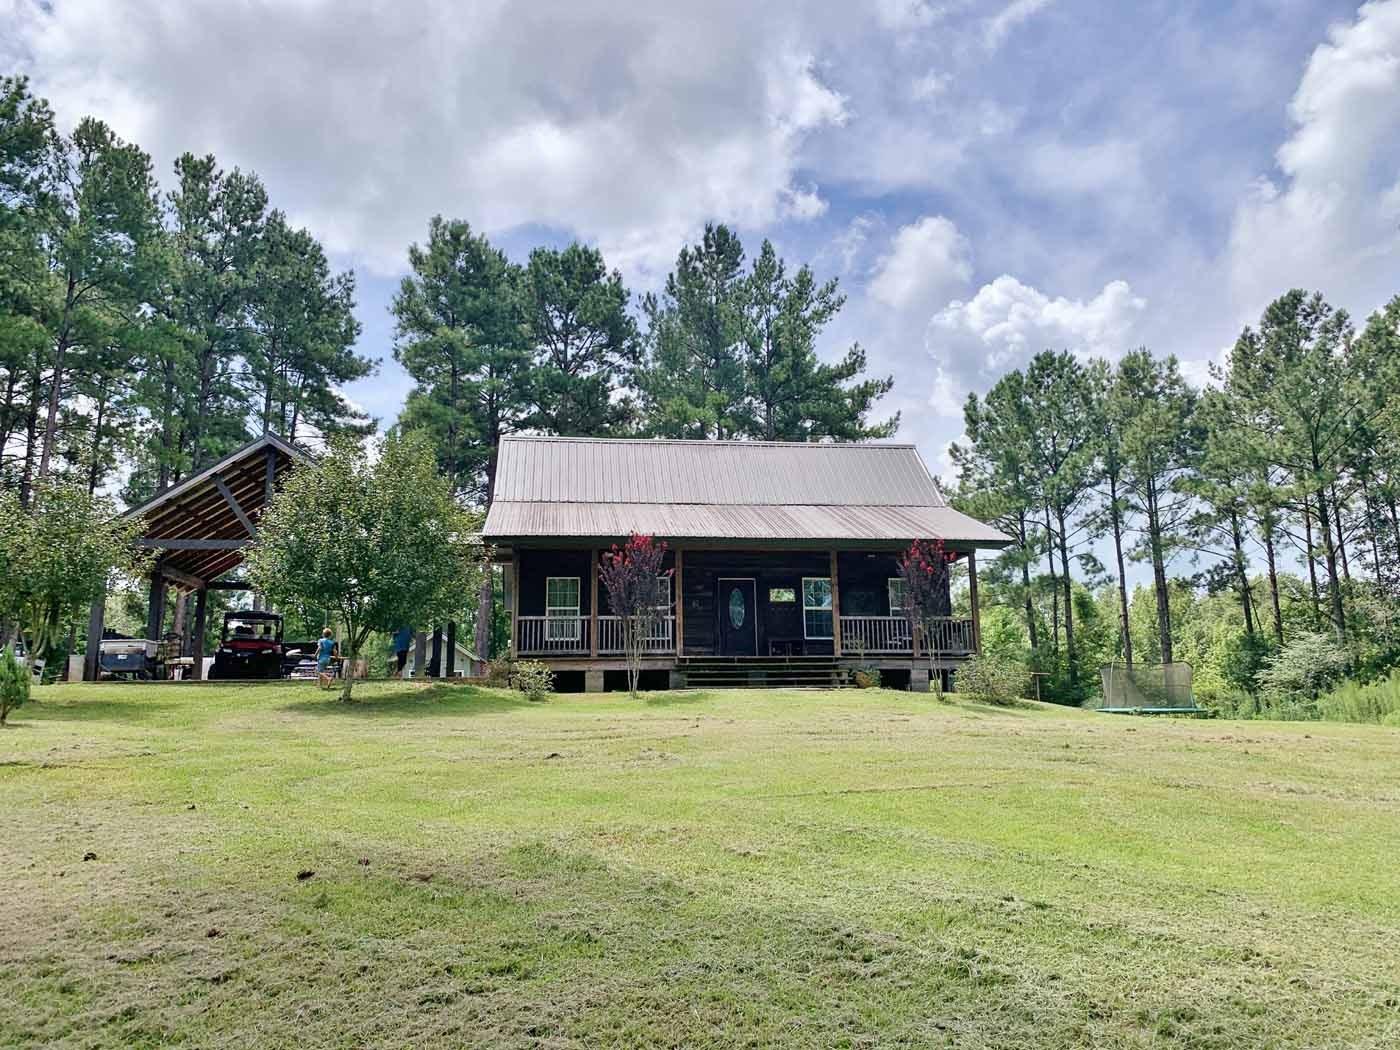 3 Bed/2  Bath Cabin, 30 Acres Land for Sale SW MS